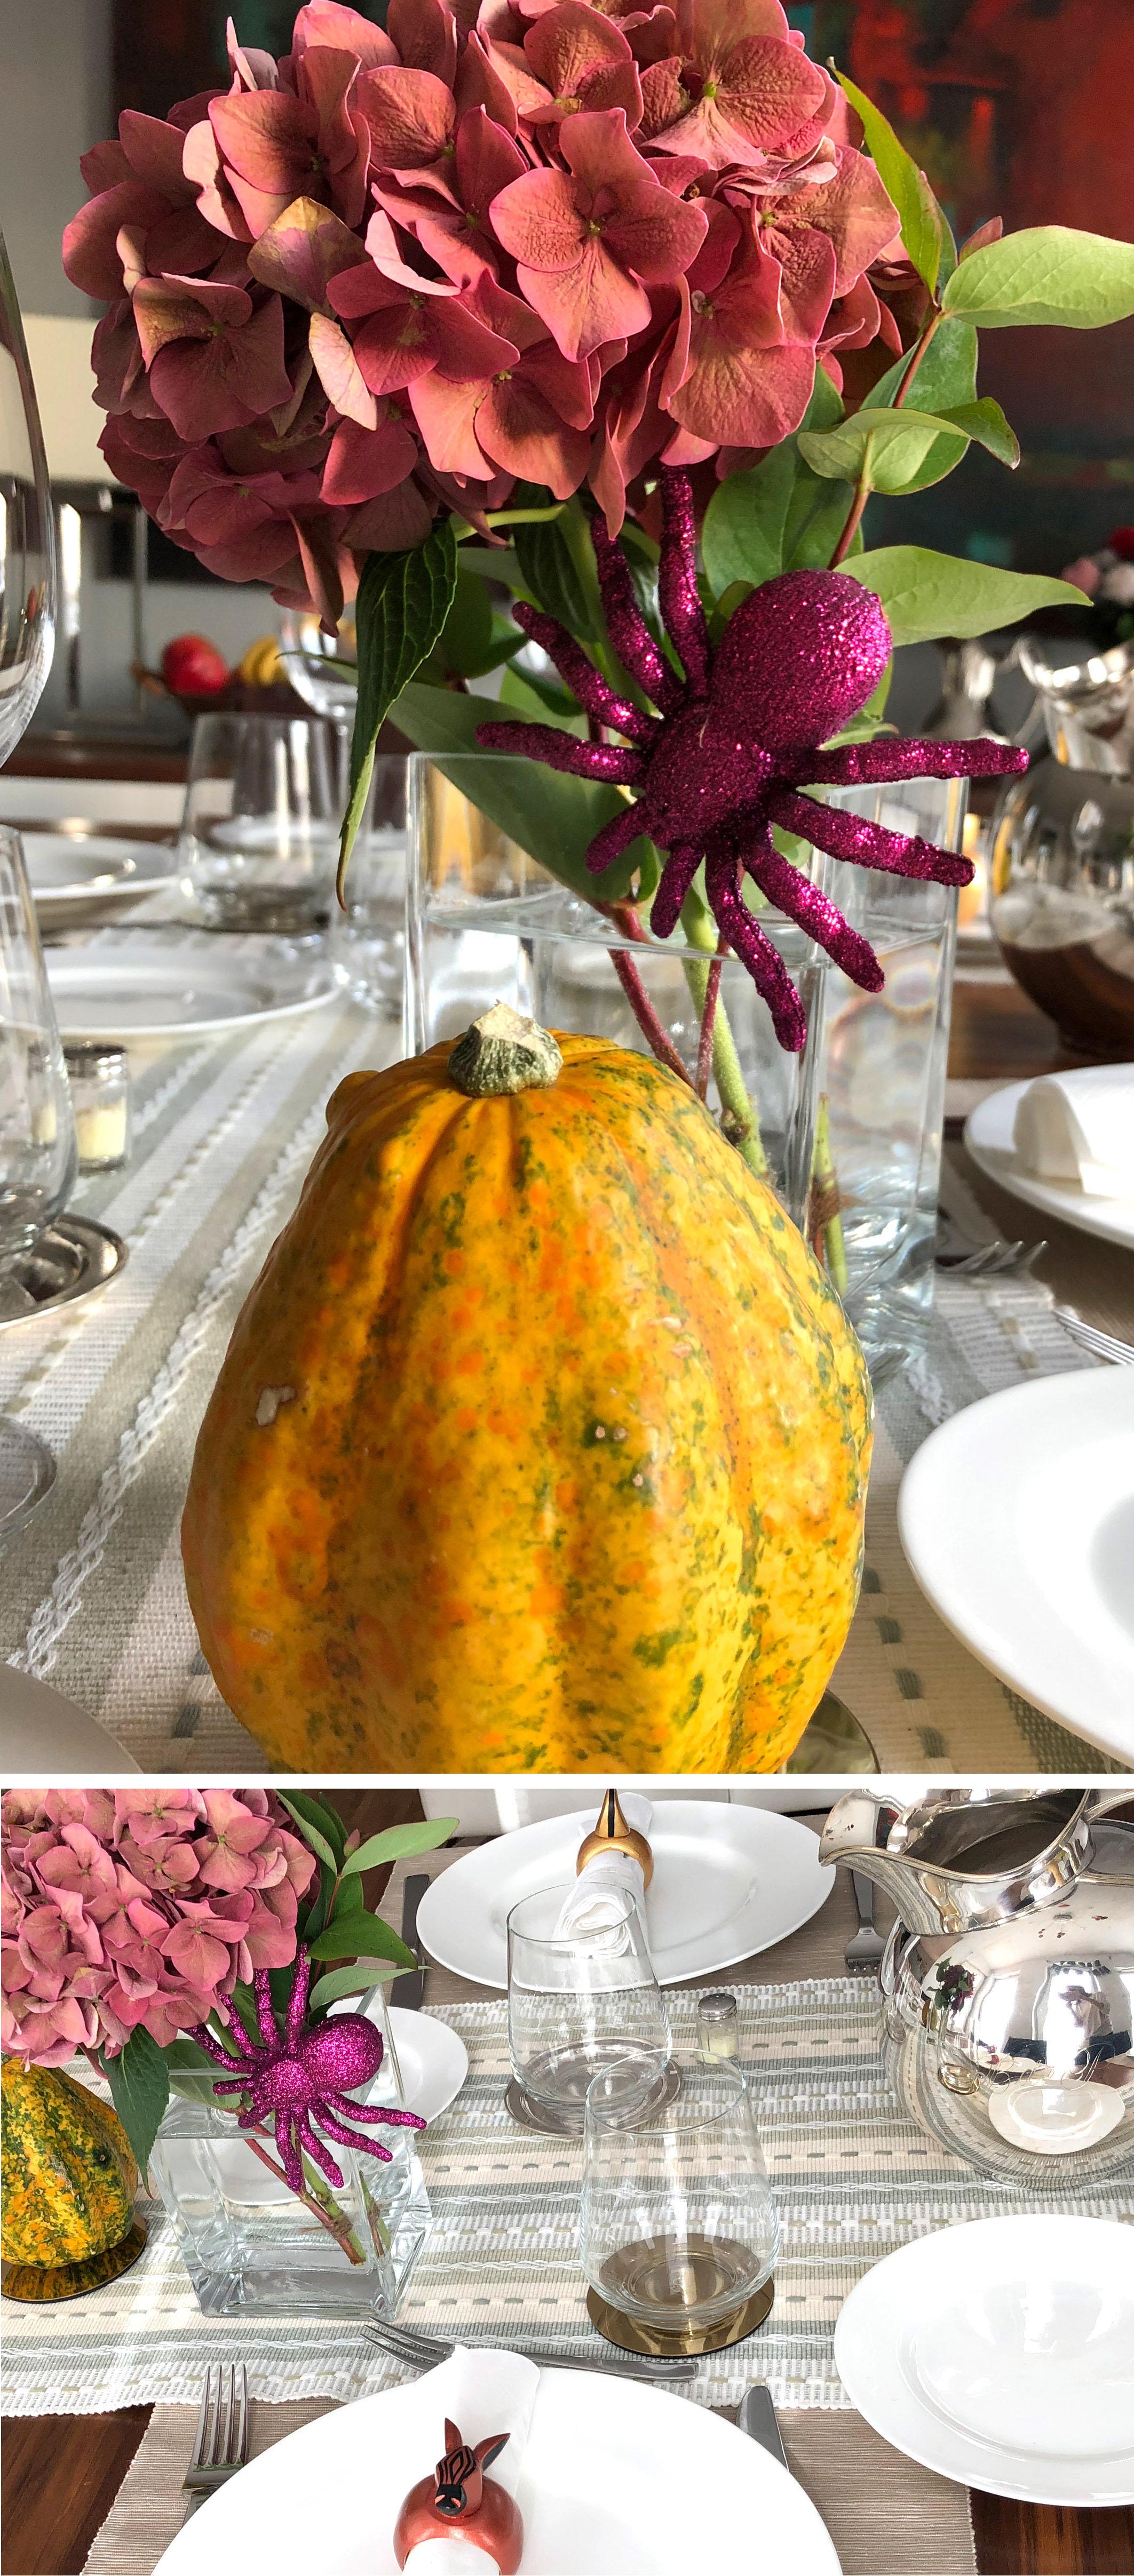 Tischdeko im Herbst Zierkürbis, Hortensie, dekorative Halloween Spinne